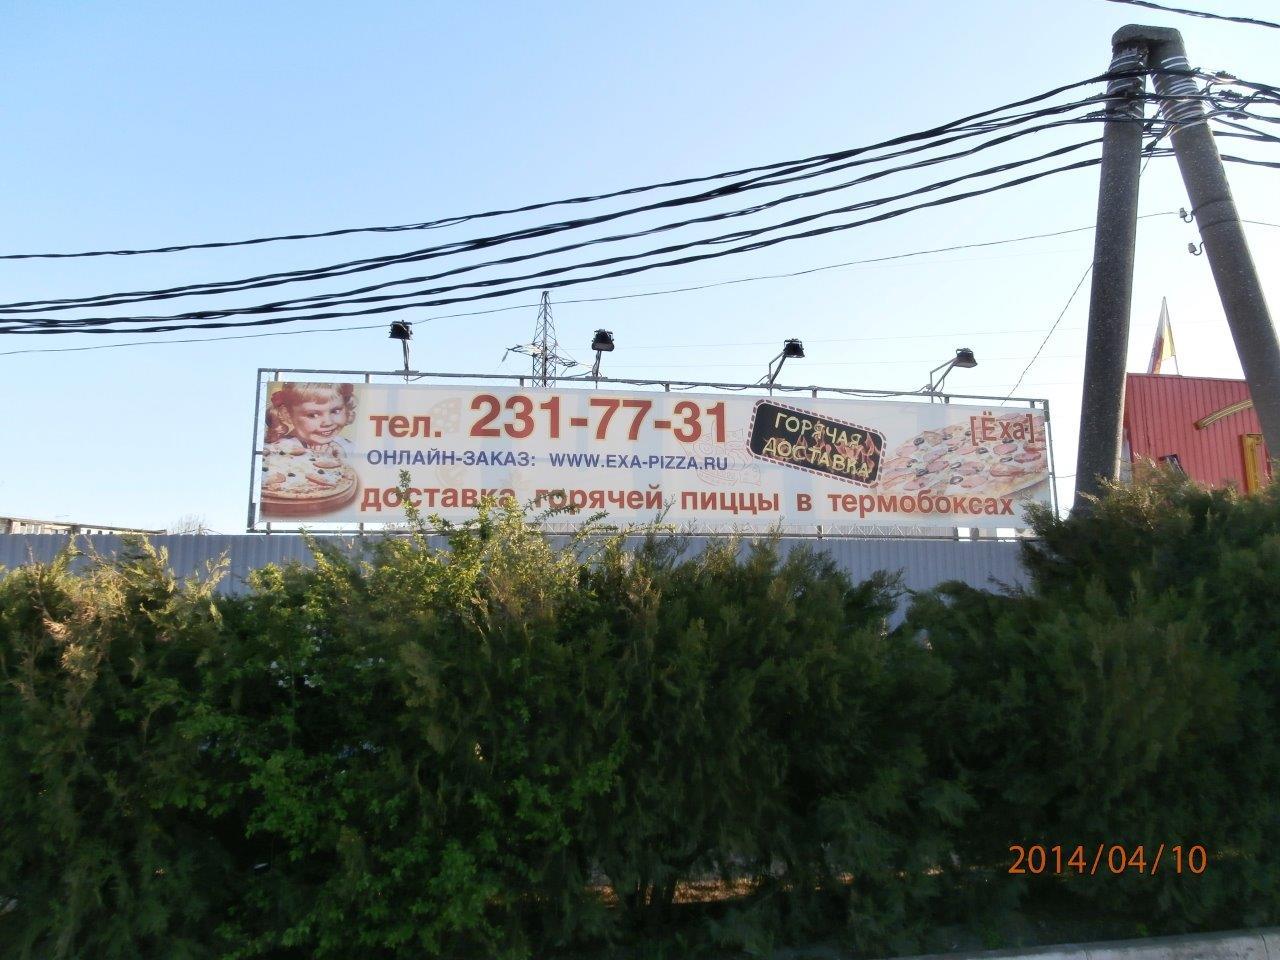 reklamnyj-shhit-banner-na-met-karkase